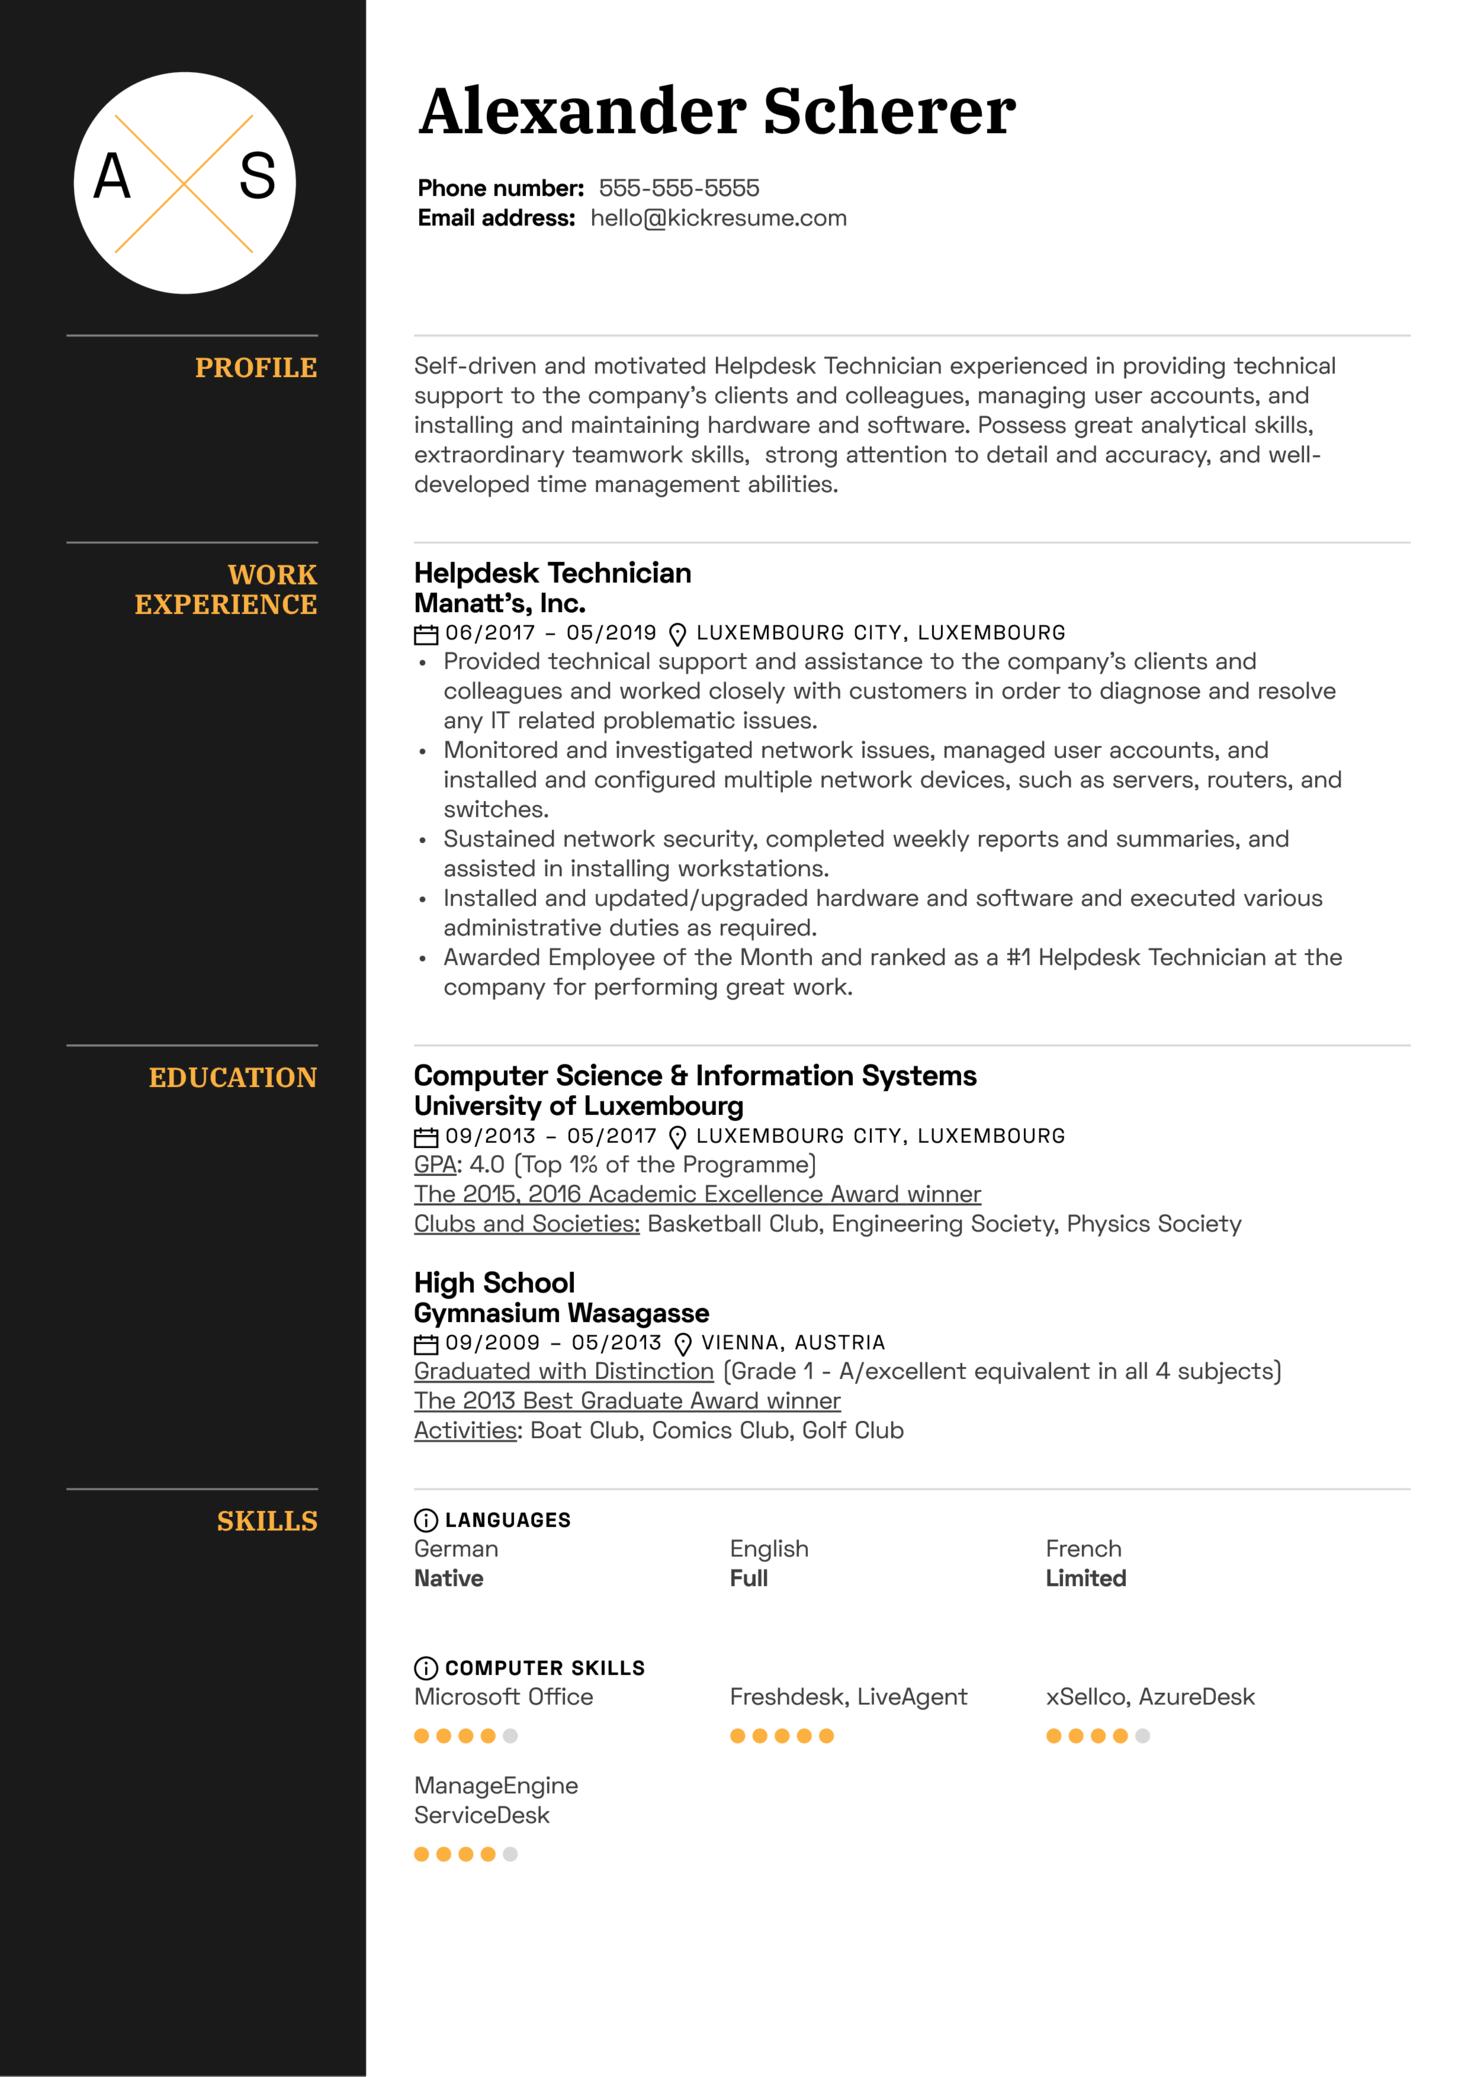 Helpdesk Technician Resume Sample (Part 1)